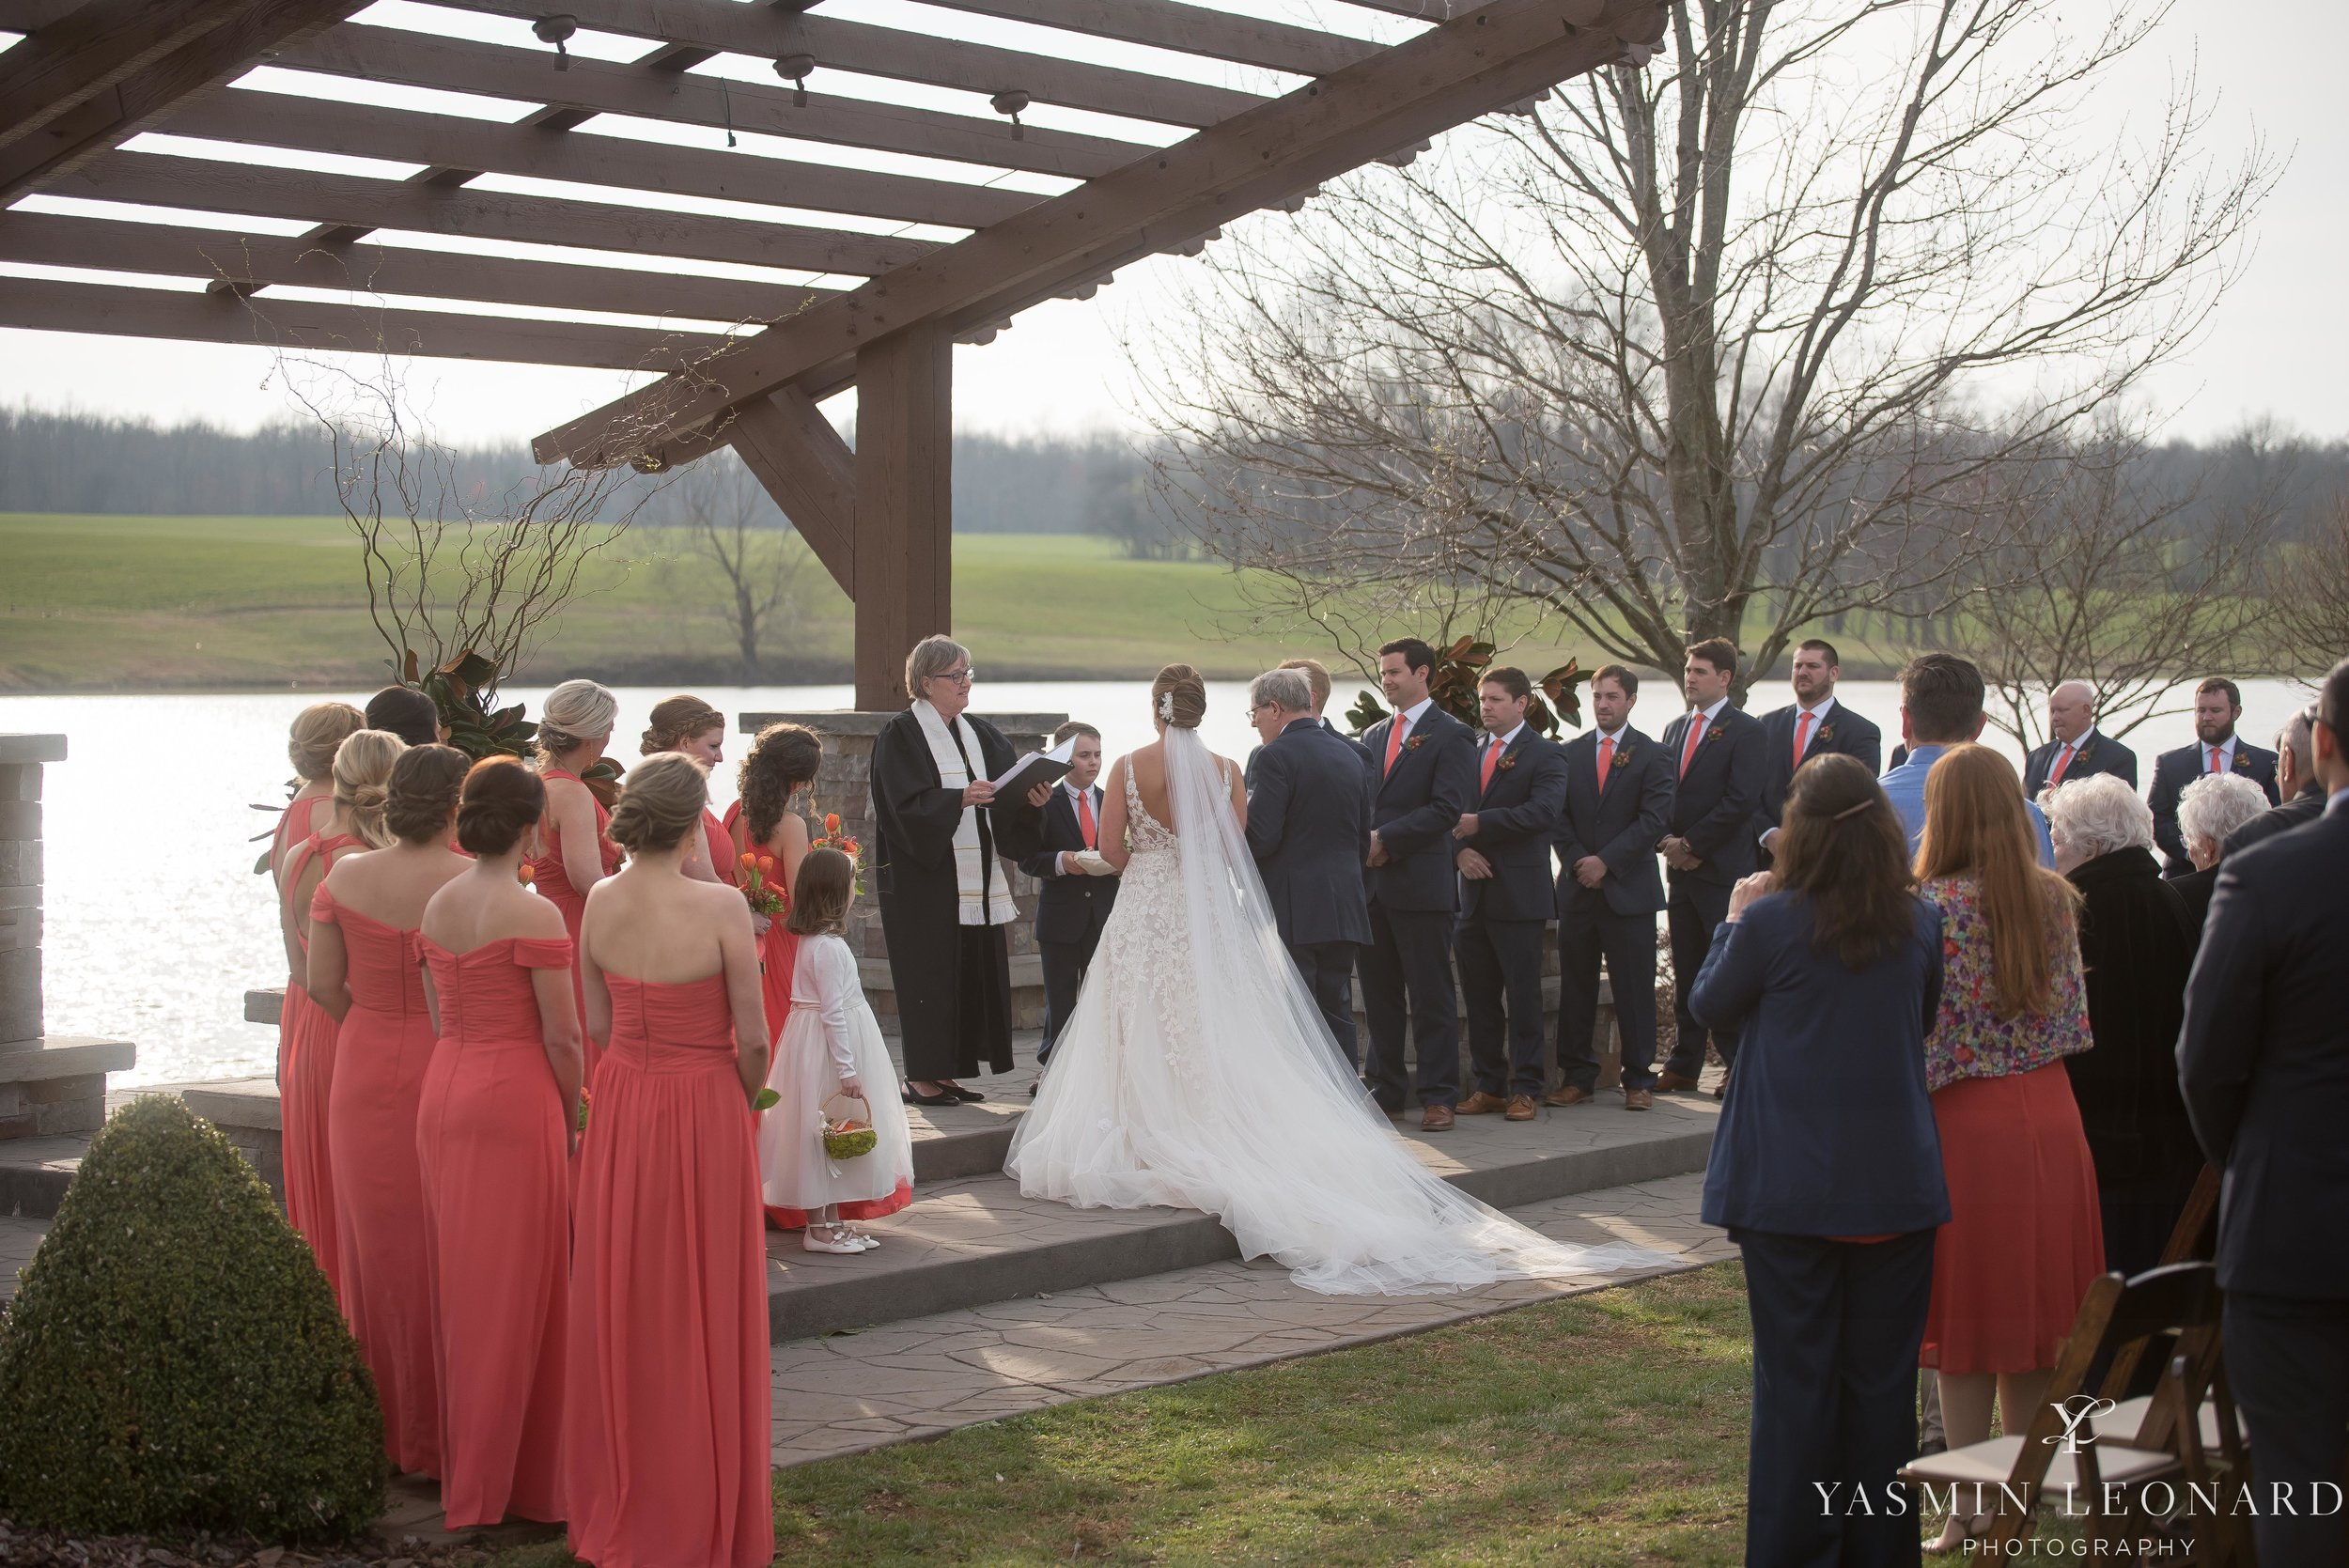 Adaumont Farm - Adaumont Farm Weddings - Trinity Weddings - NC Weddings - Yasmin Leonard Photography-33.jpg